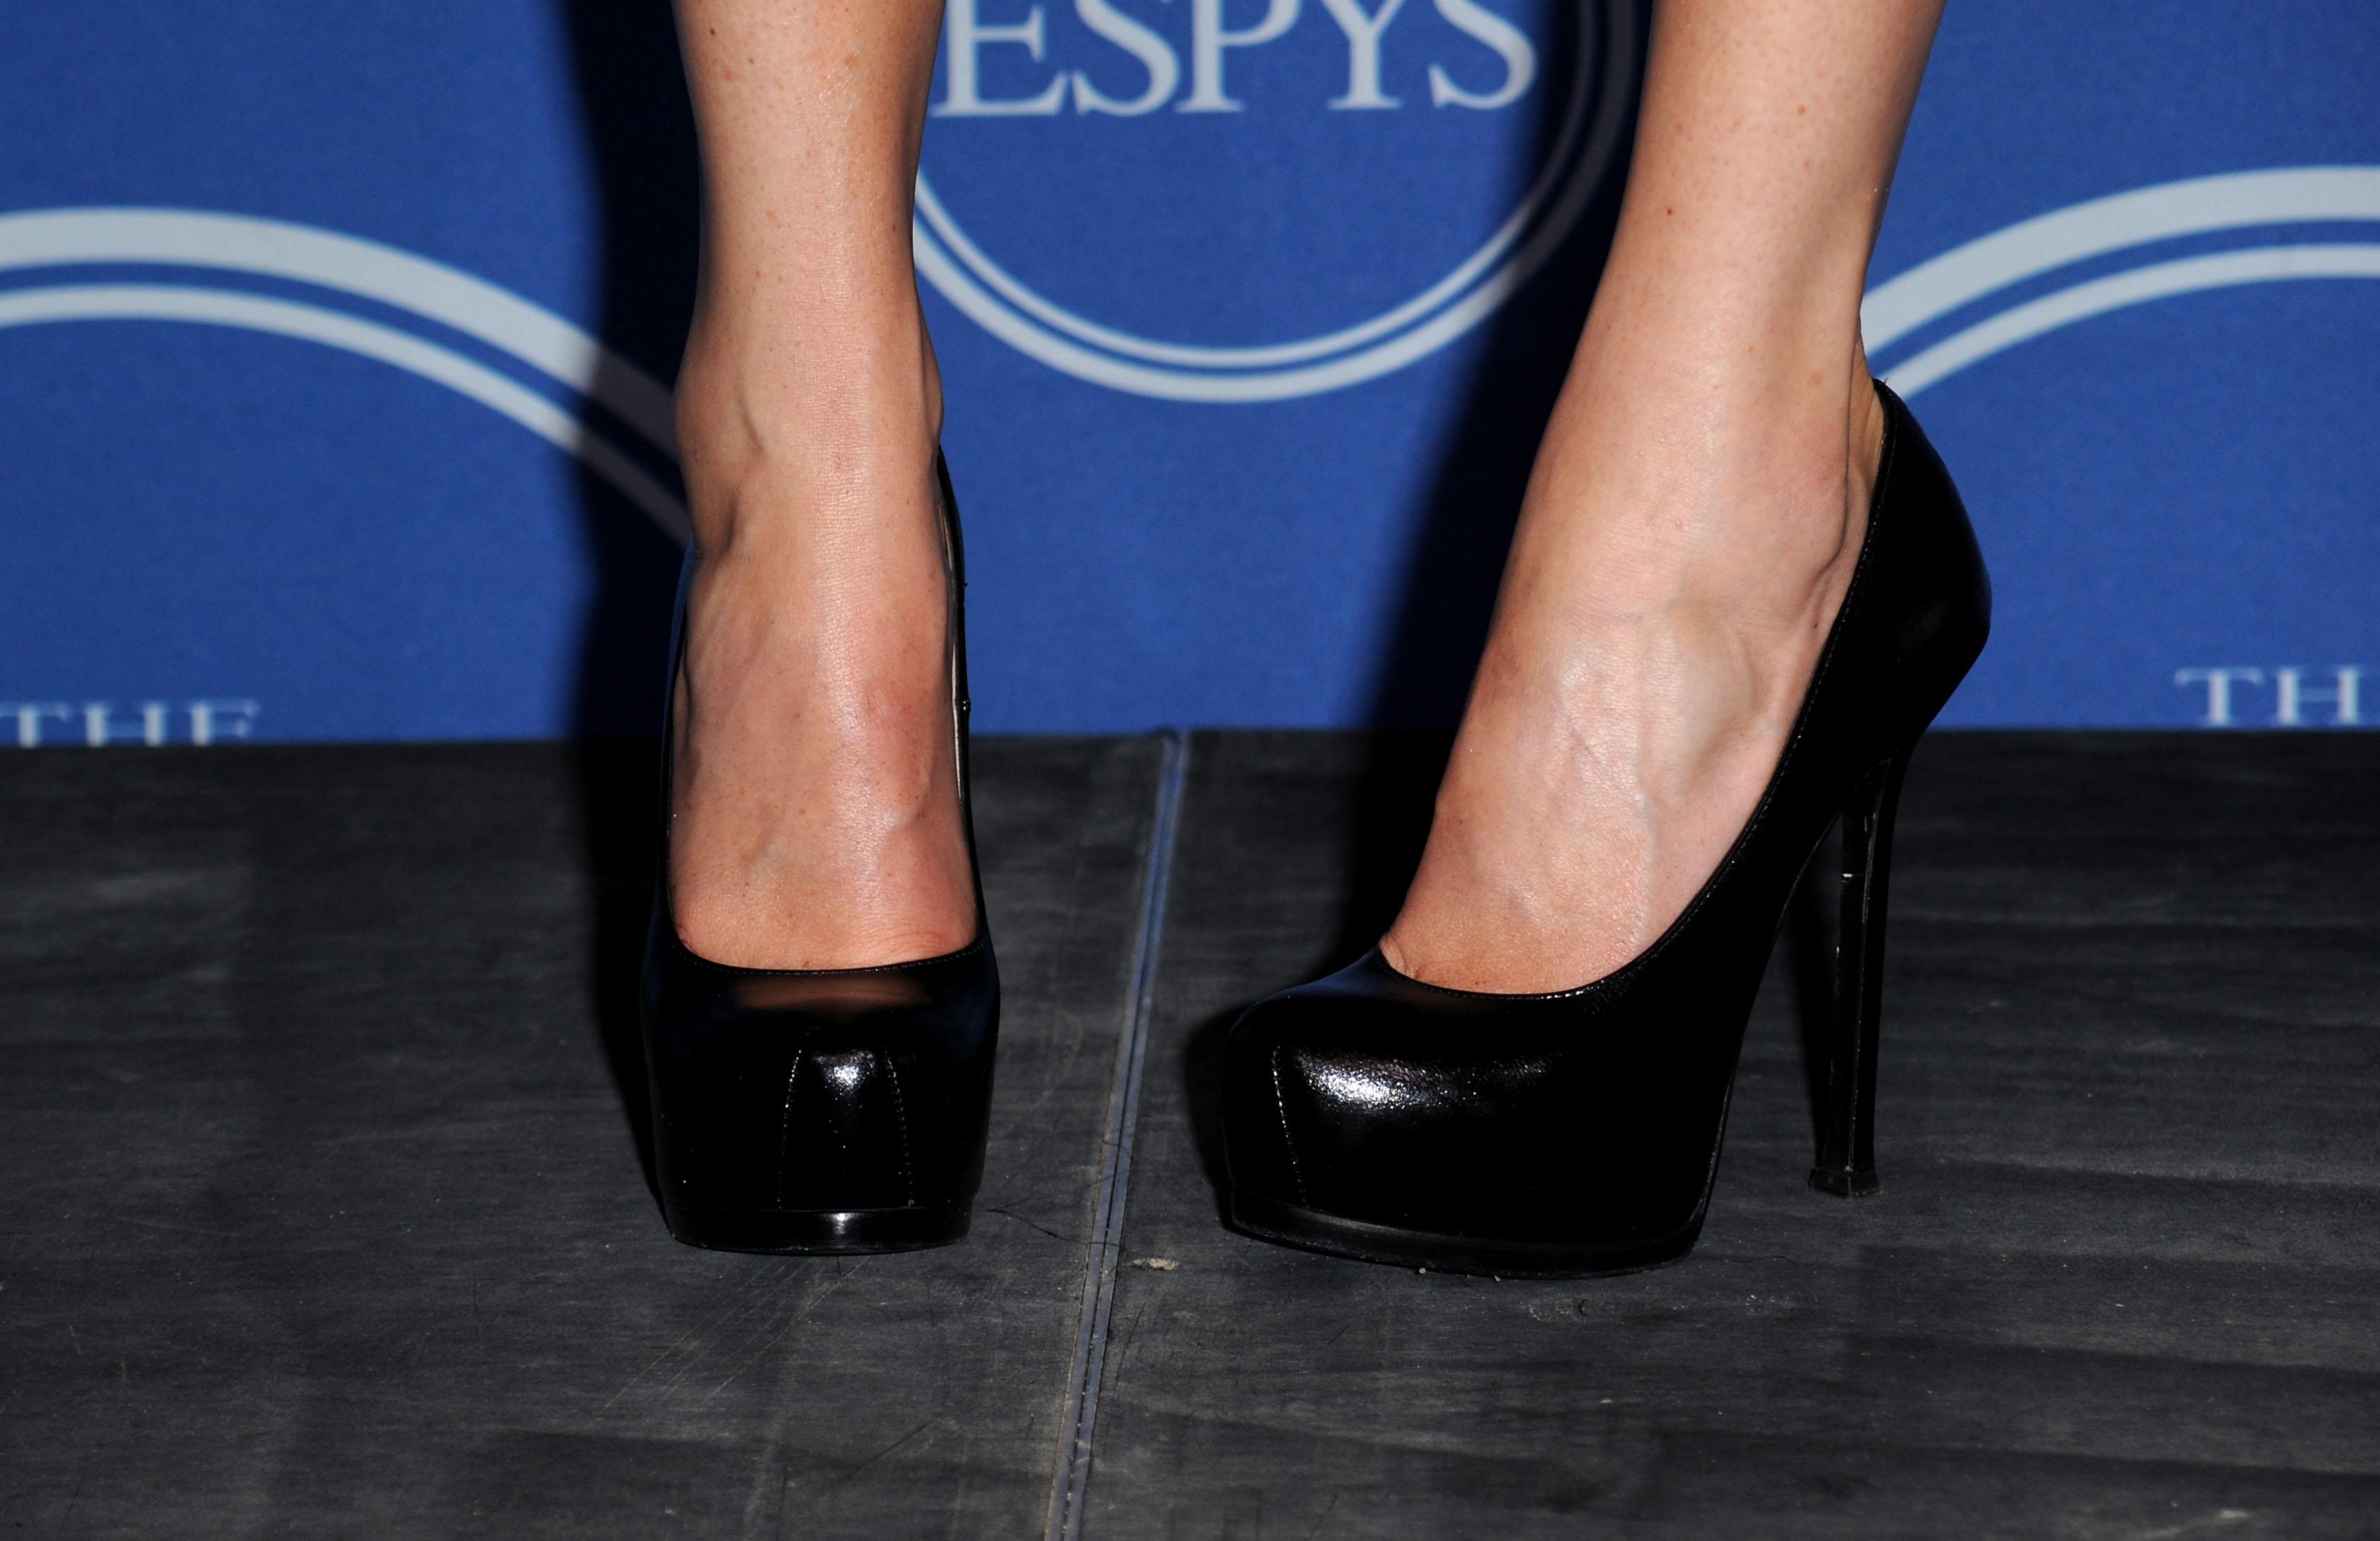 00662_Marisa_Miller_ESPY_Awards_12_122_471lo.jpg